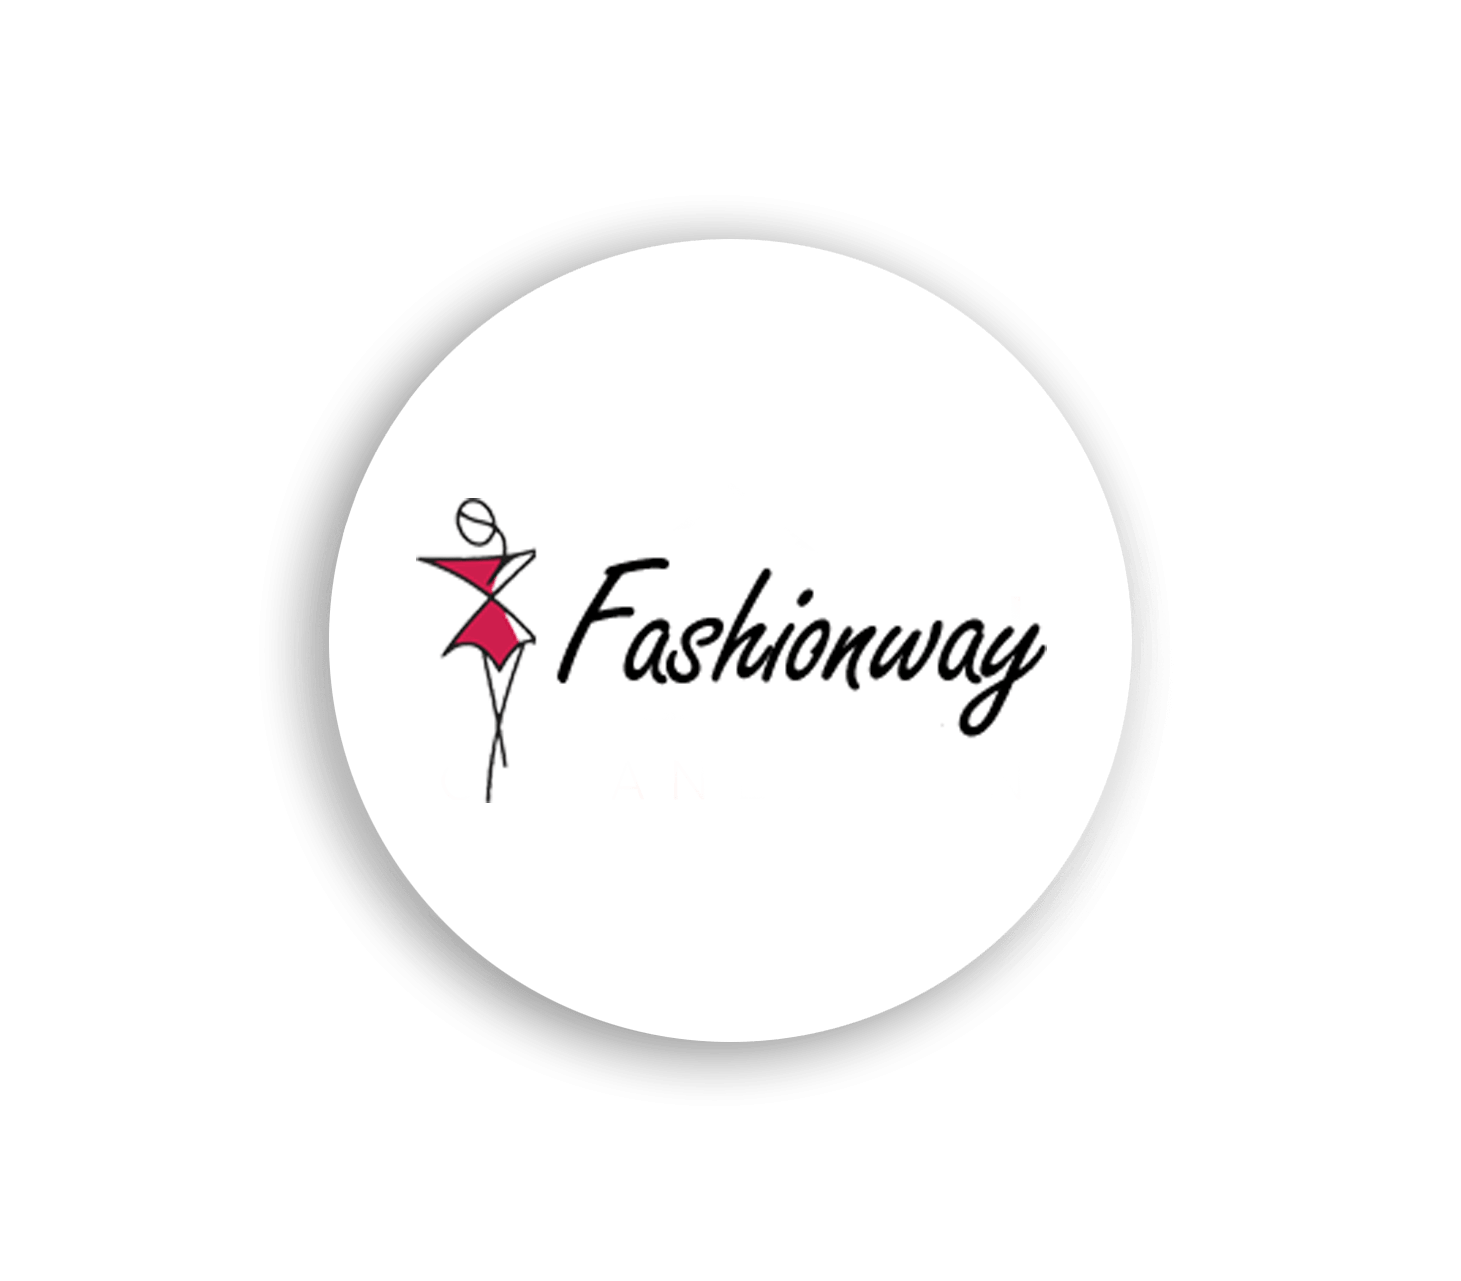 fashionway-logo